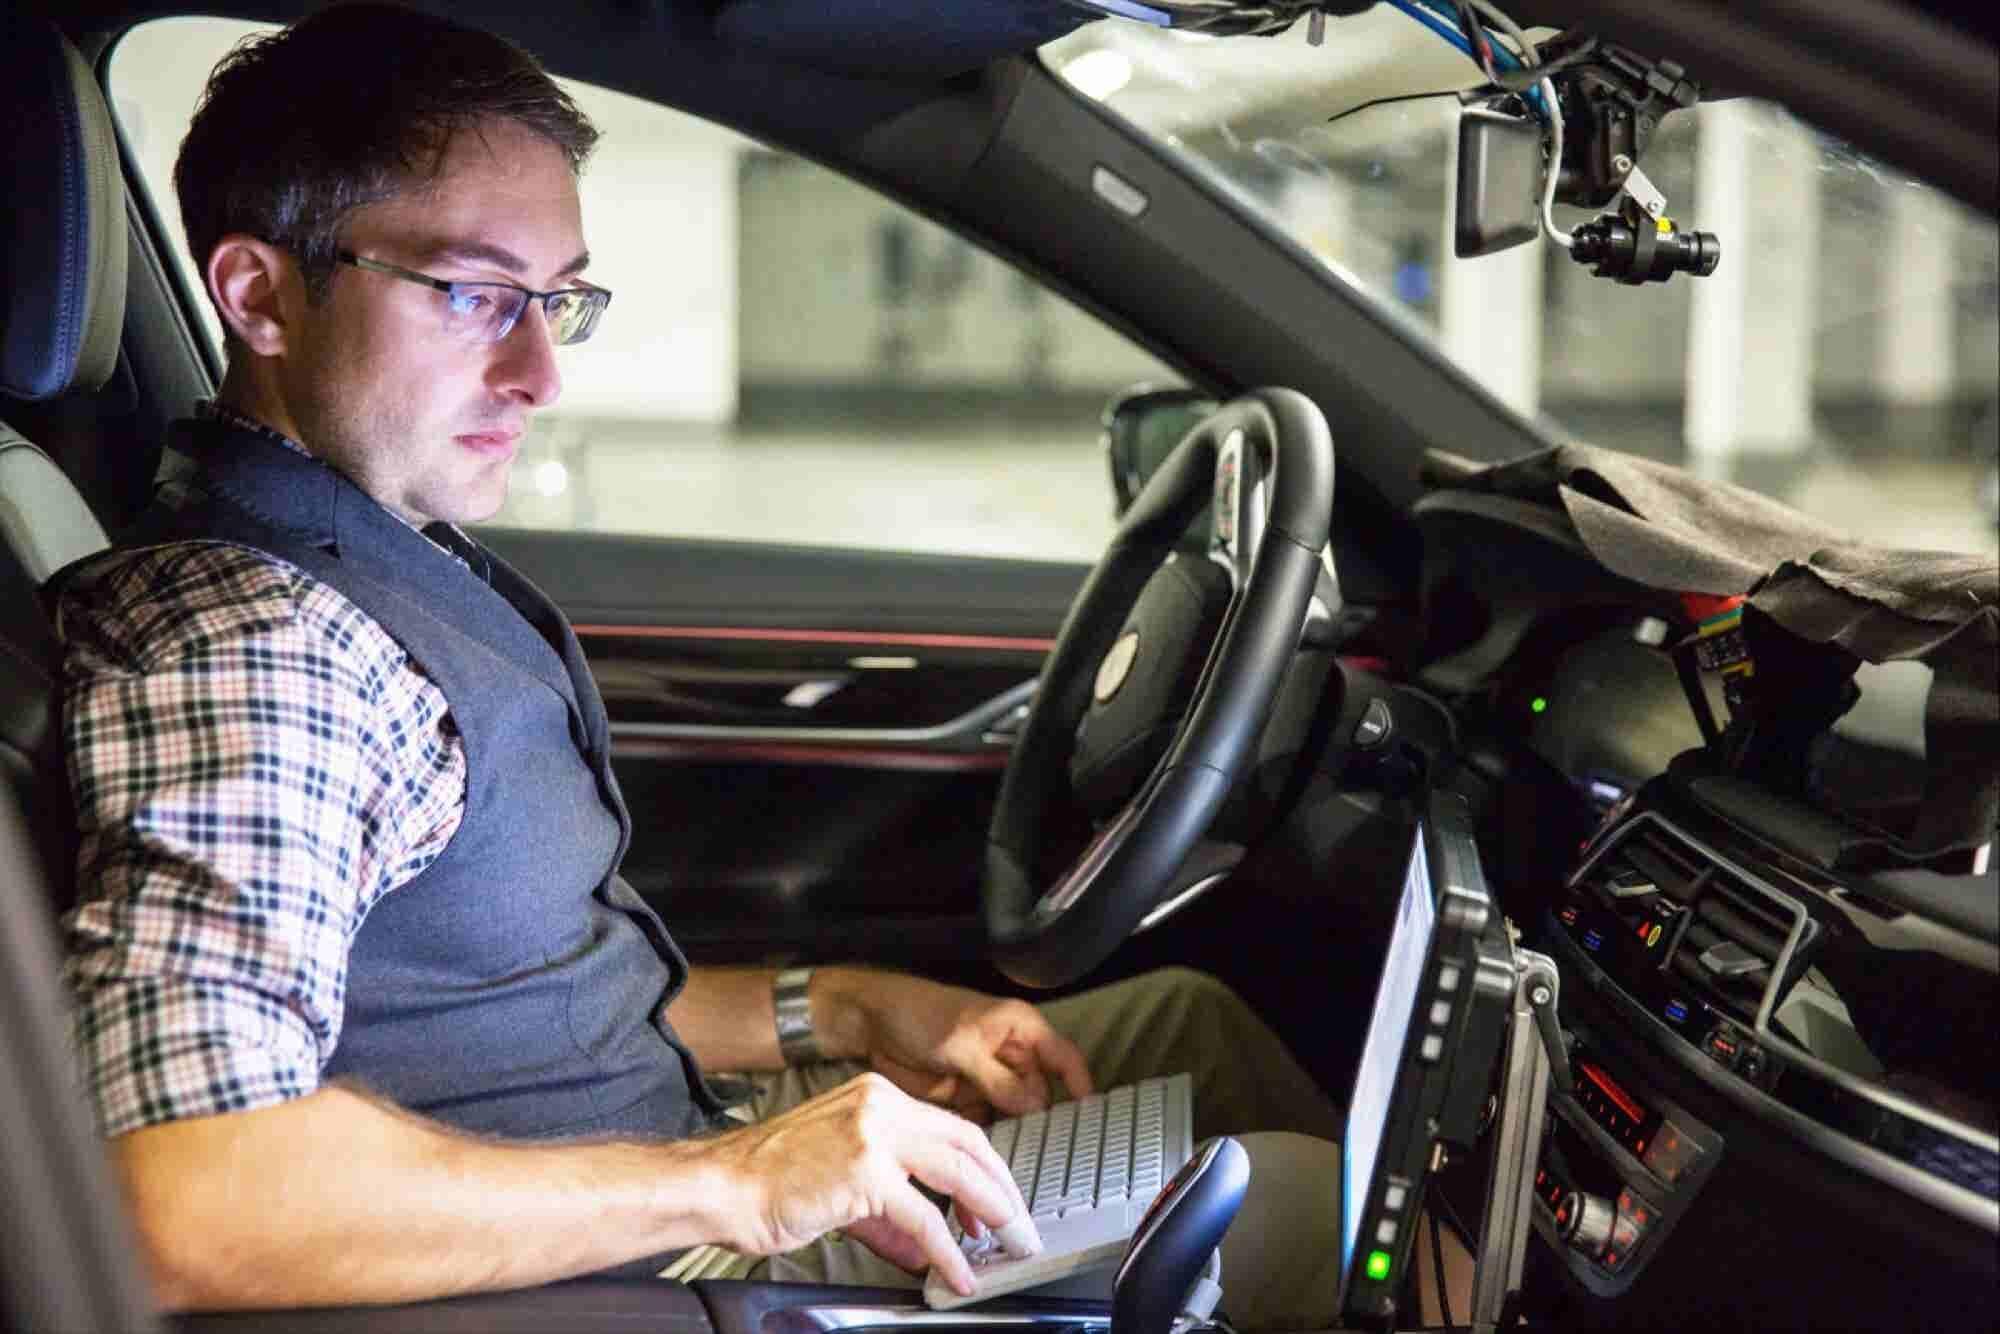 Intel Buys Self-Driving Tech Firm MobilEye for $15.3 Billion